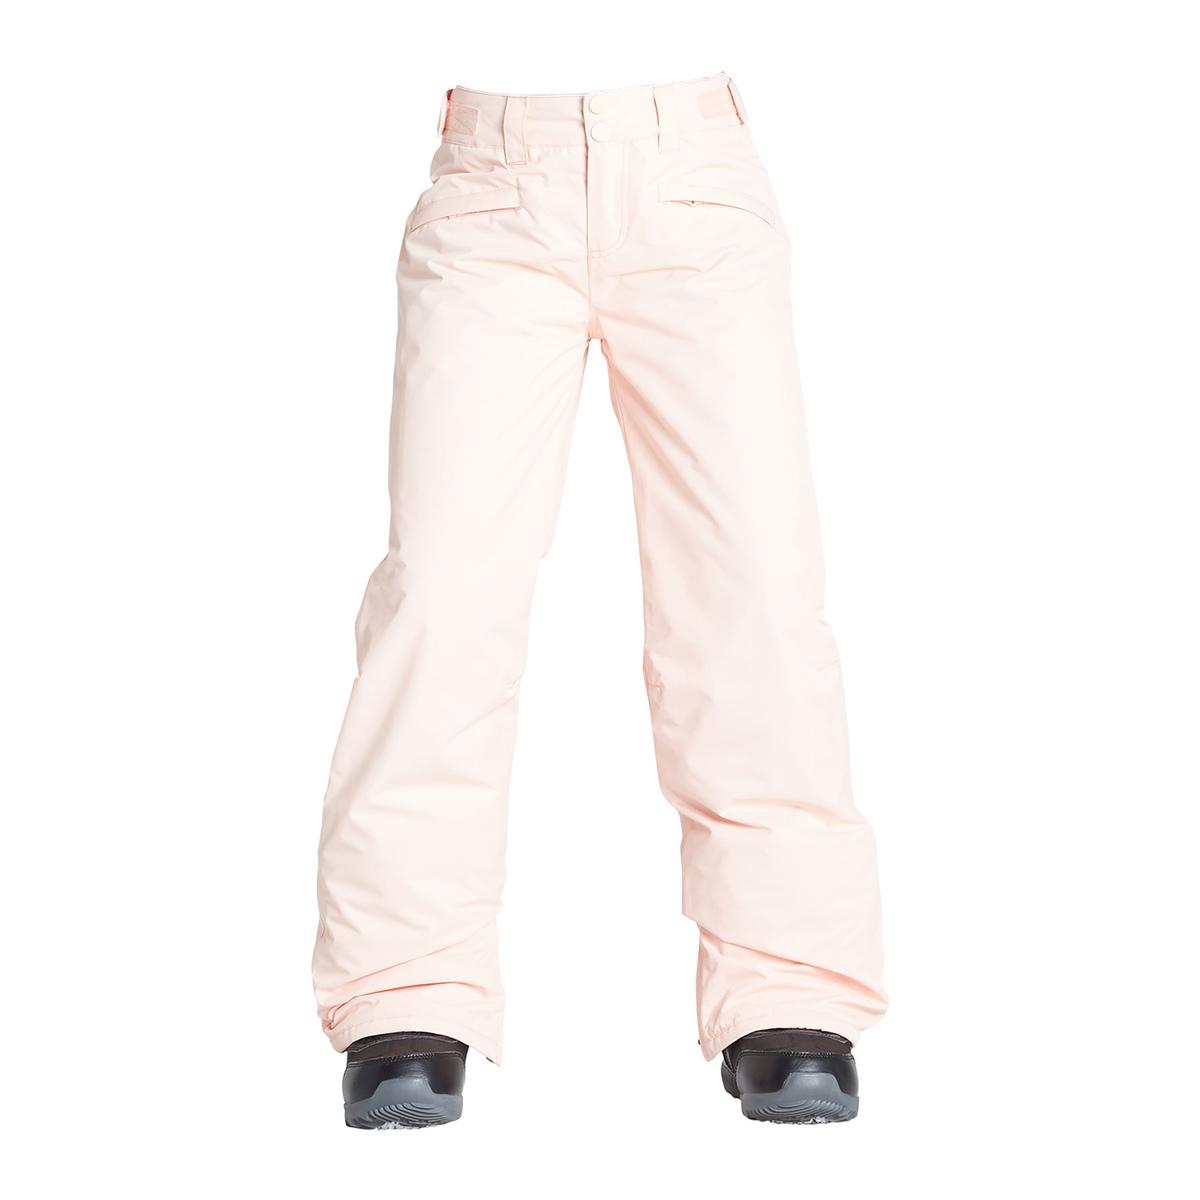 Prezzi Billabong pantaloni alue bambina